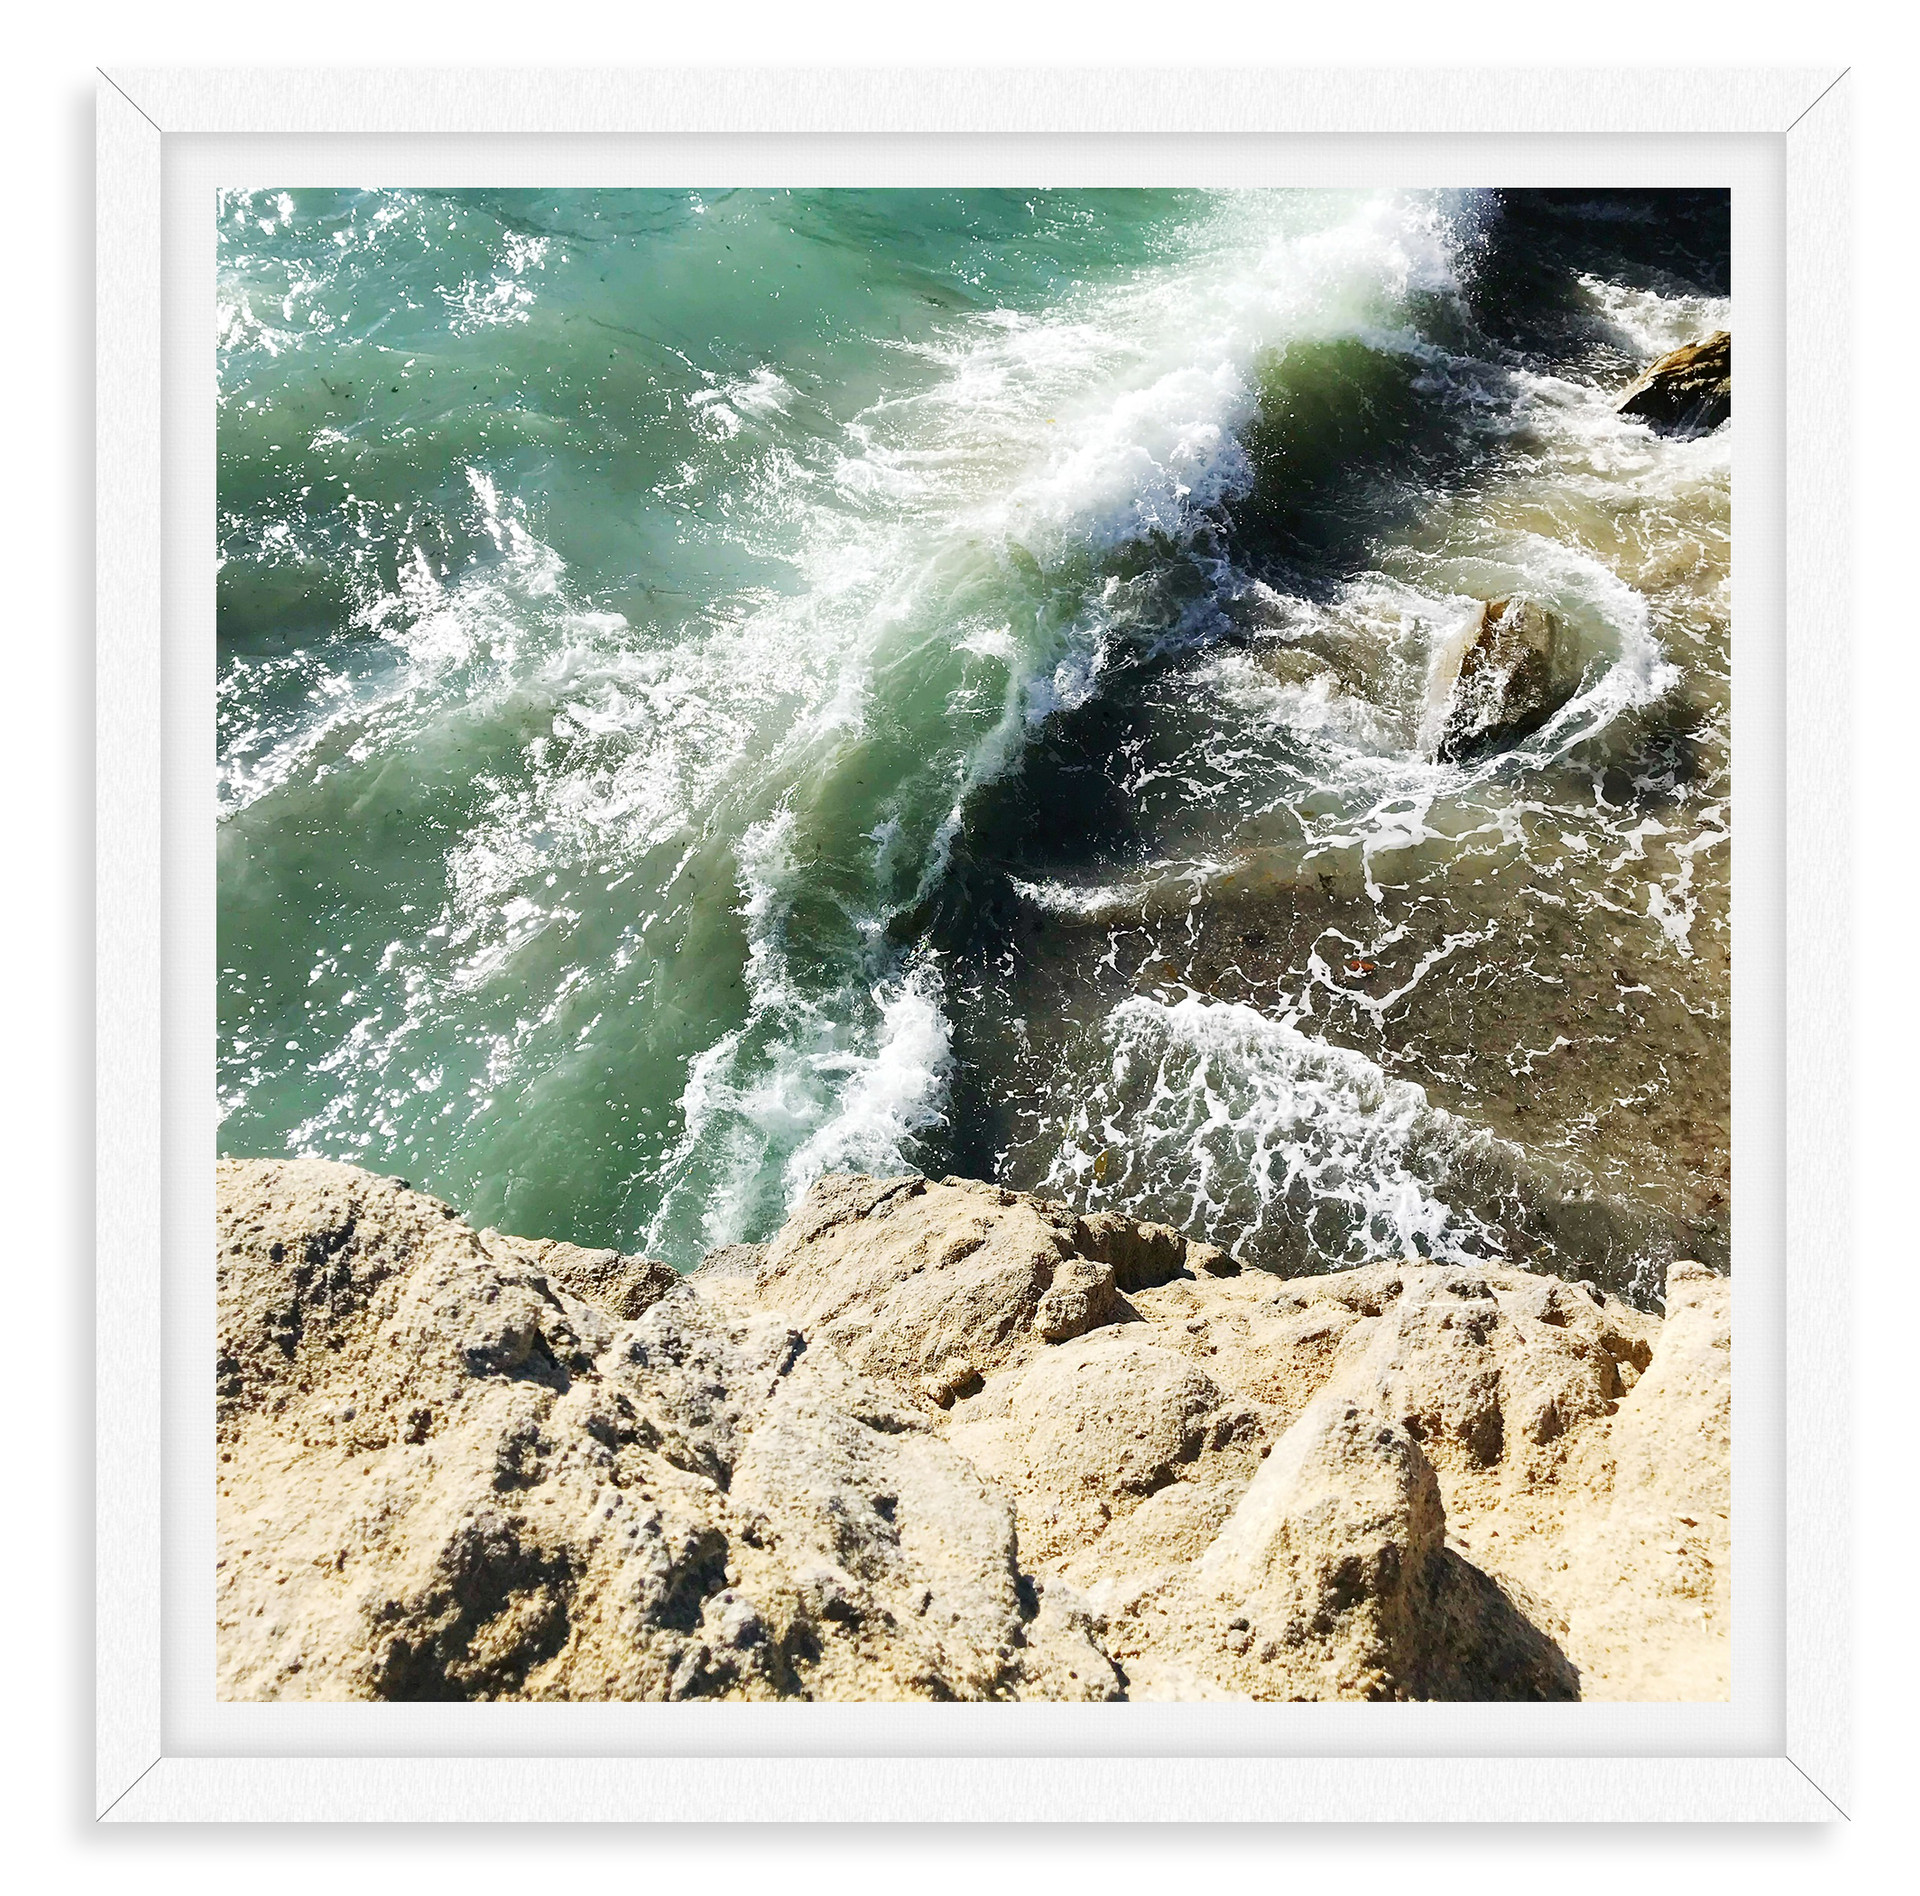 malibu cliffs beach frosty waves blue oc